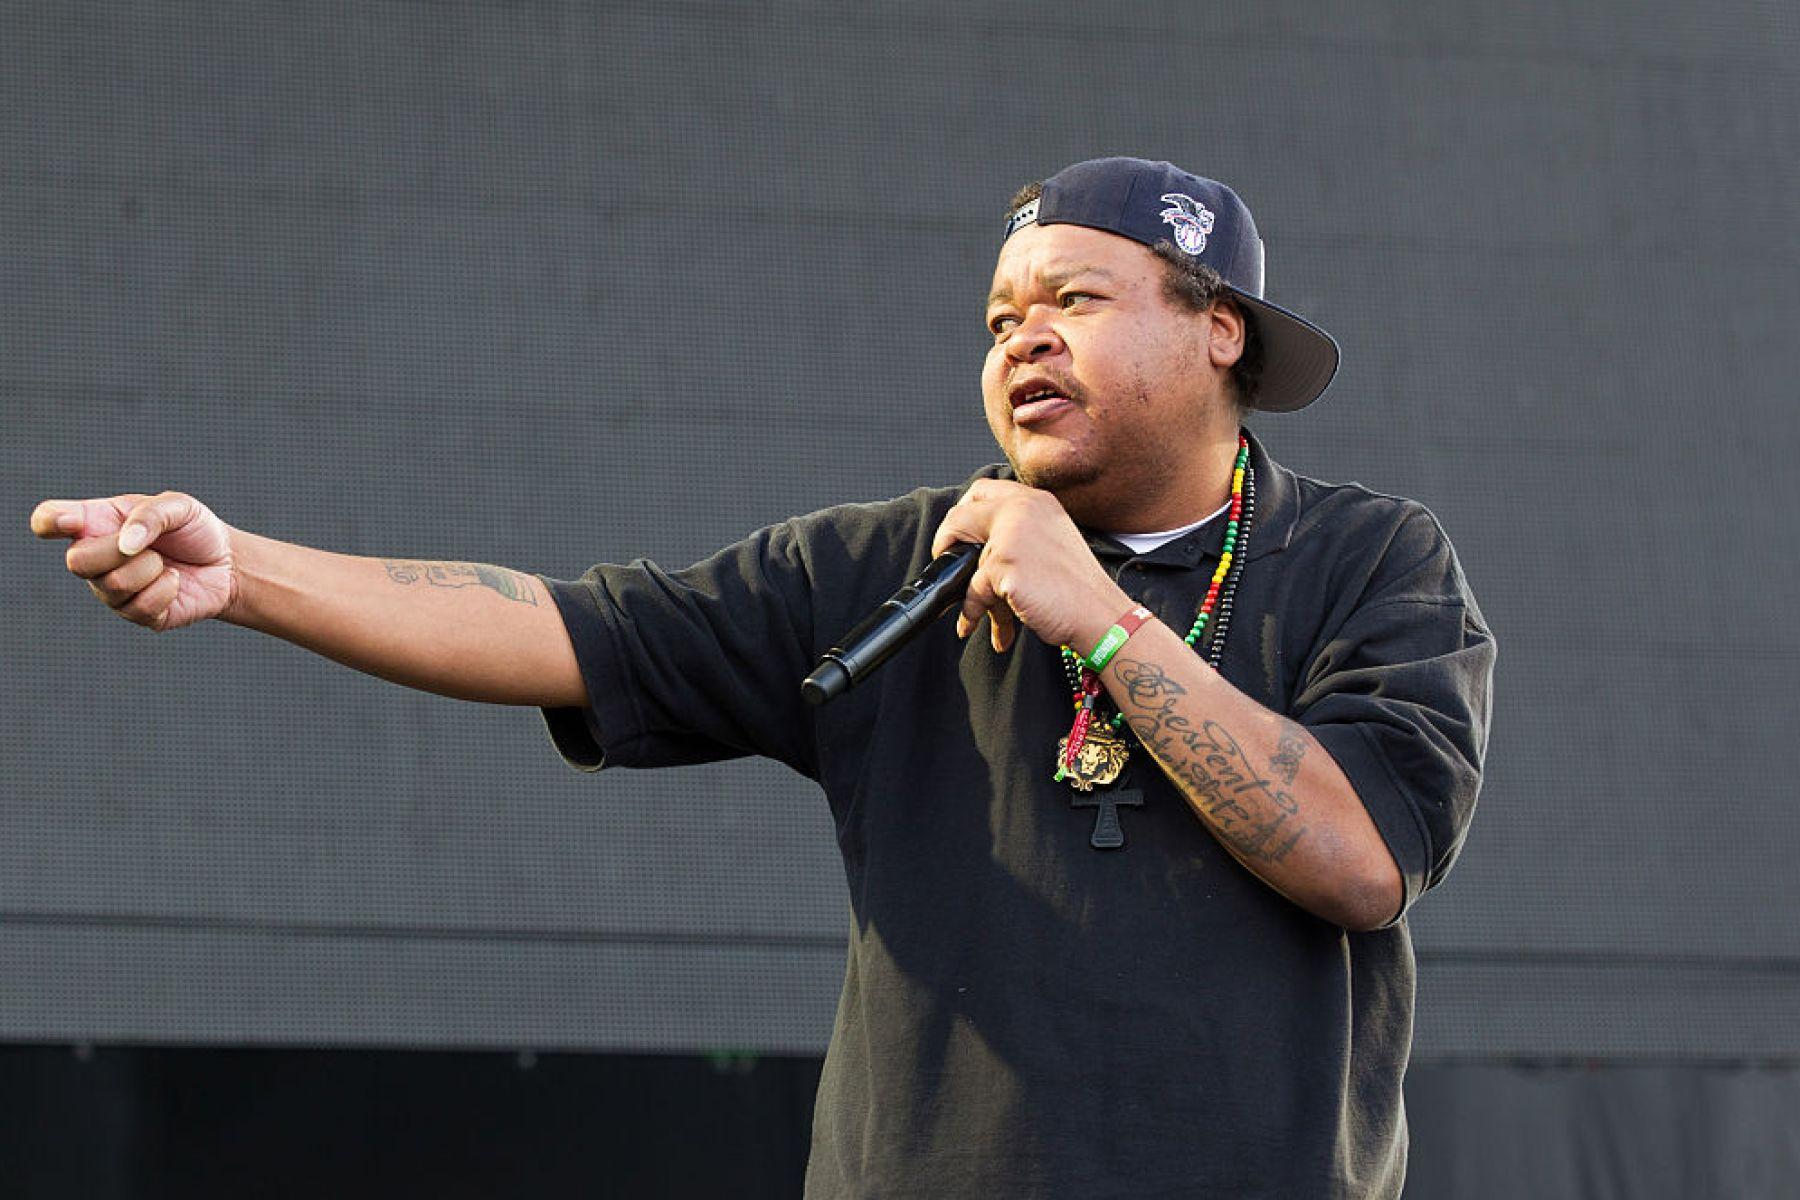 NAPA, CA - MAY 31:  Rapper Michael Turner aka Double K of People Under the Stairs performs at Bottle Rock festival at Napa Valley Expo on May 31, 2015 in Napa, California.  (Photo by Miikka Skaffari/FilmMagic)